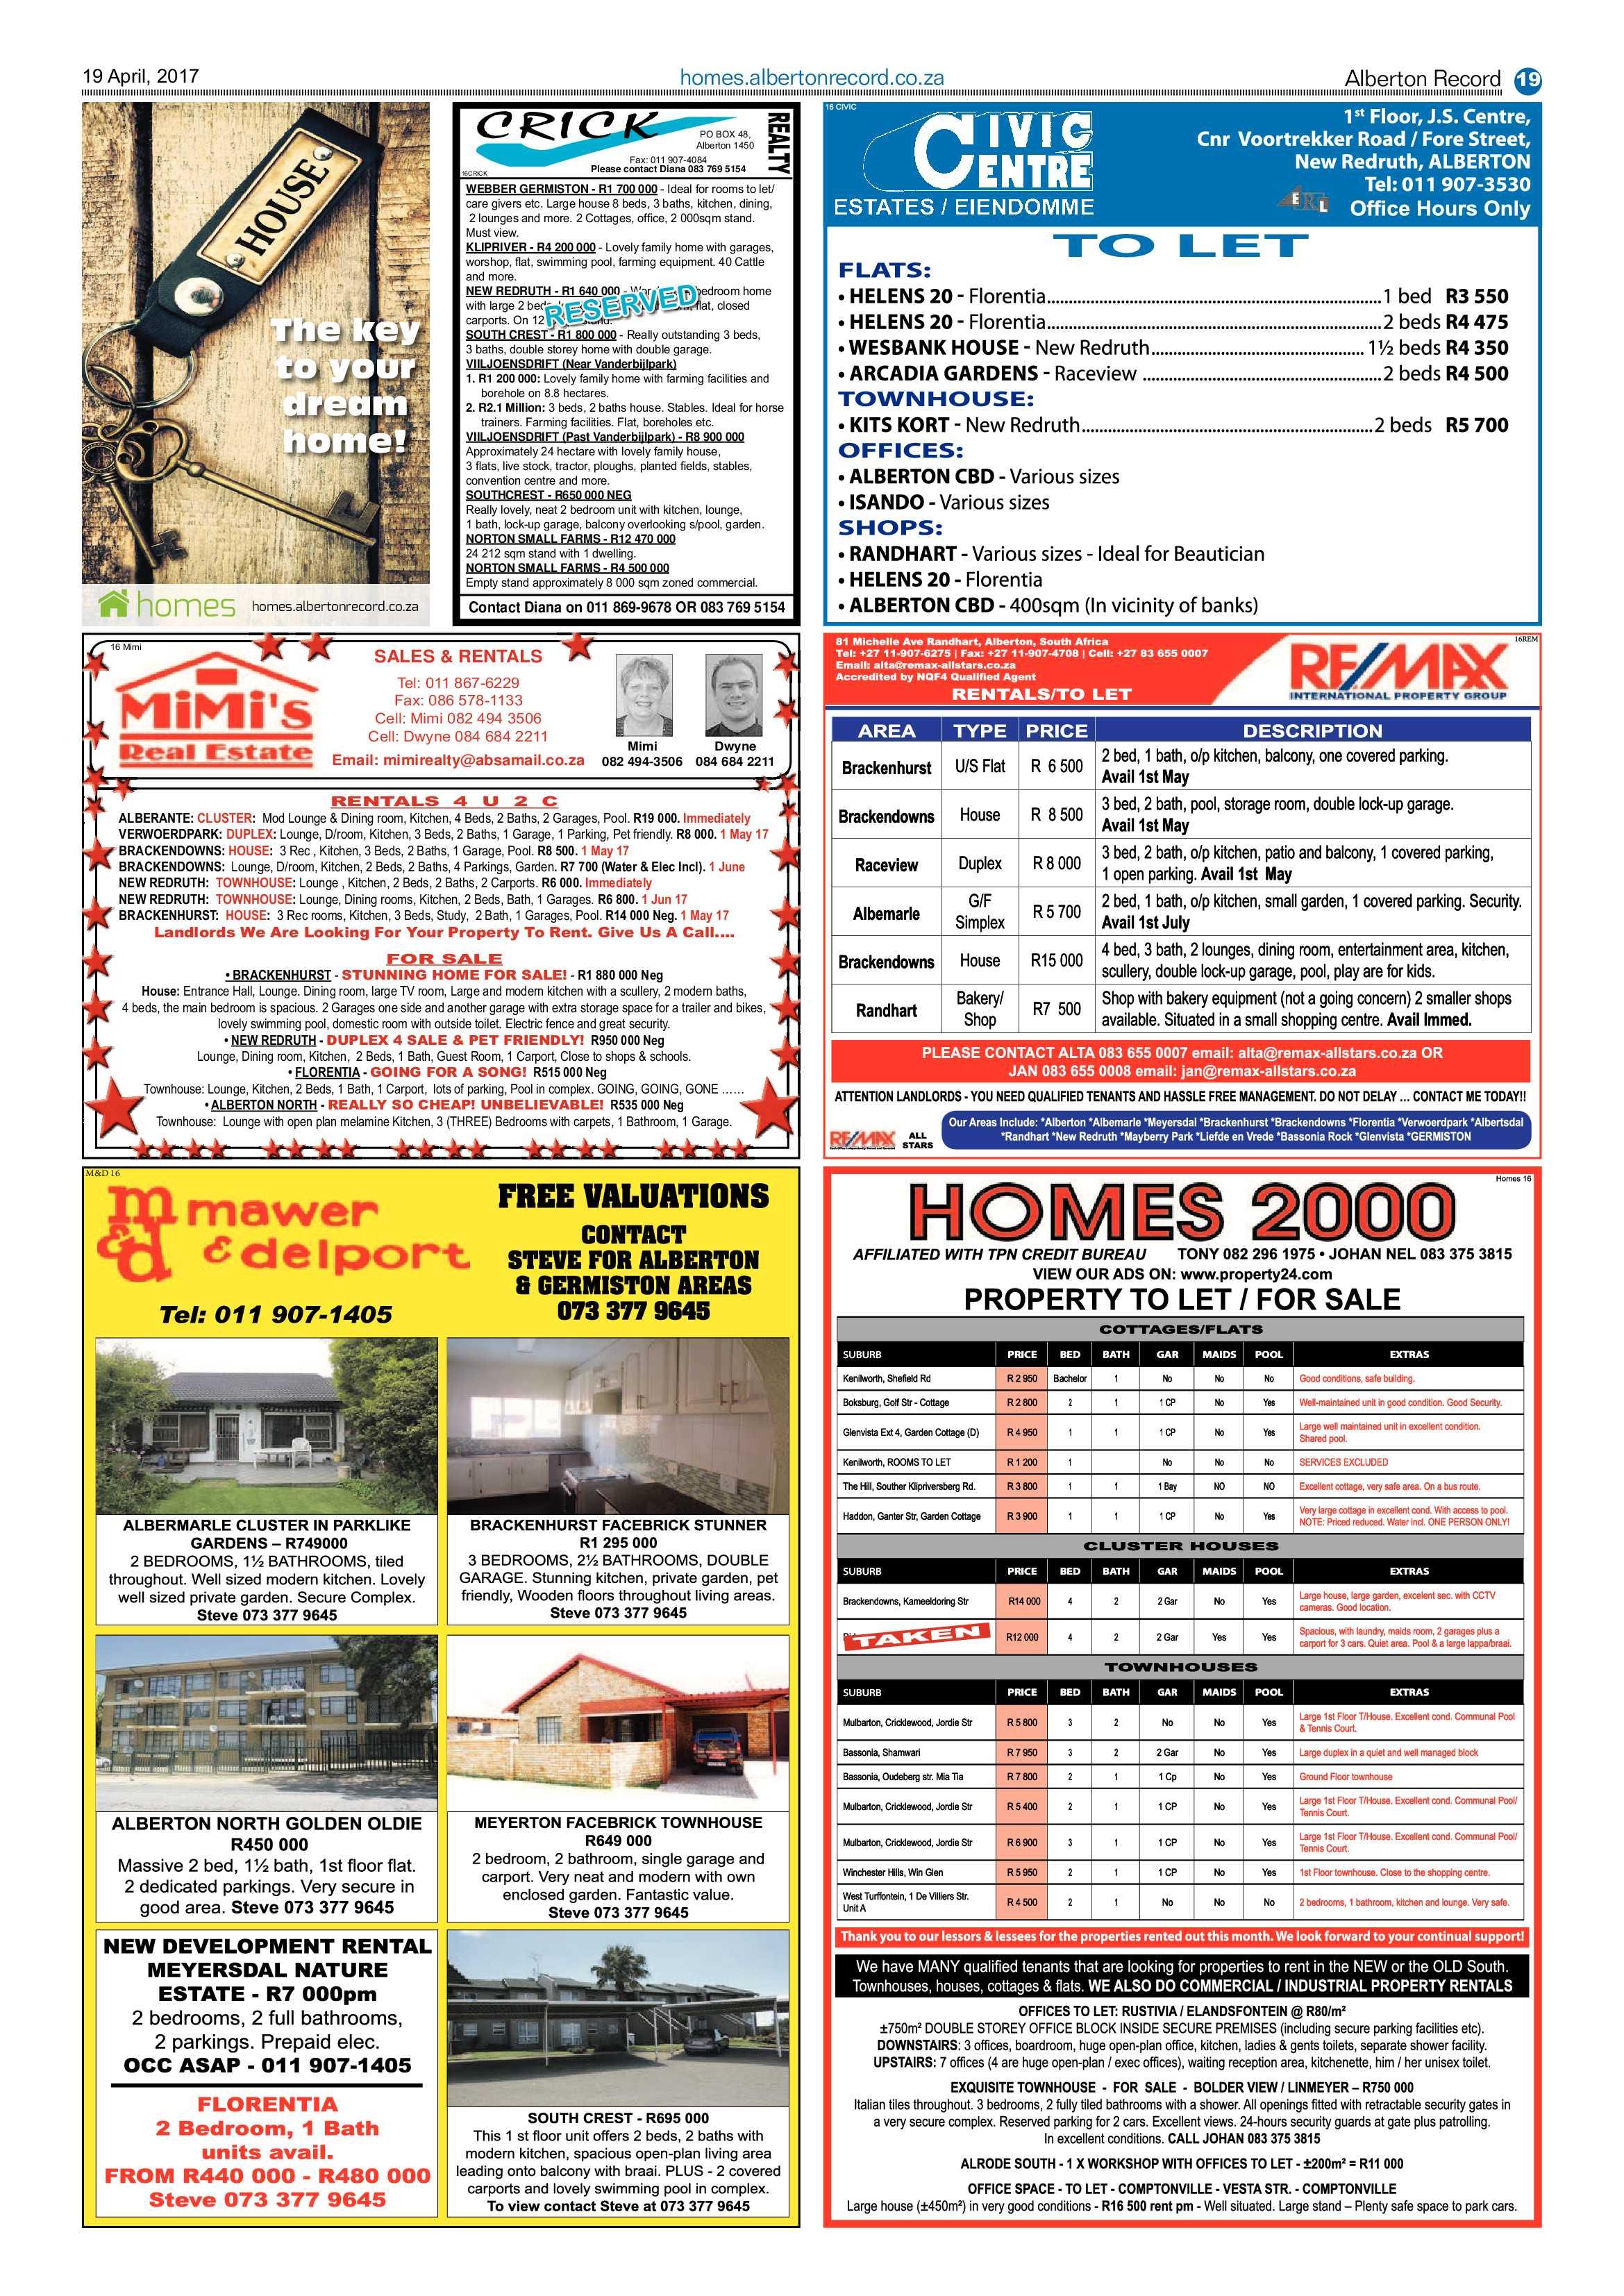 alberton-record-19-april-2017-epapers-page-19